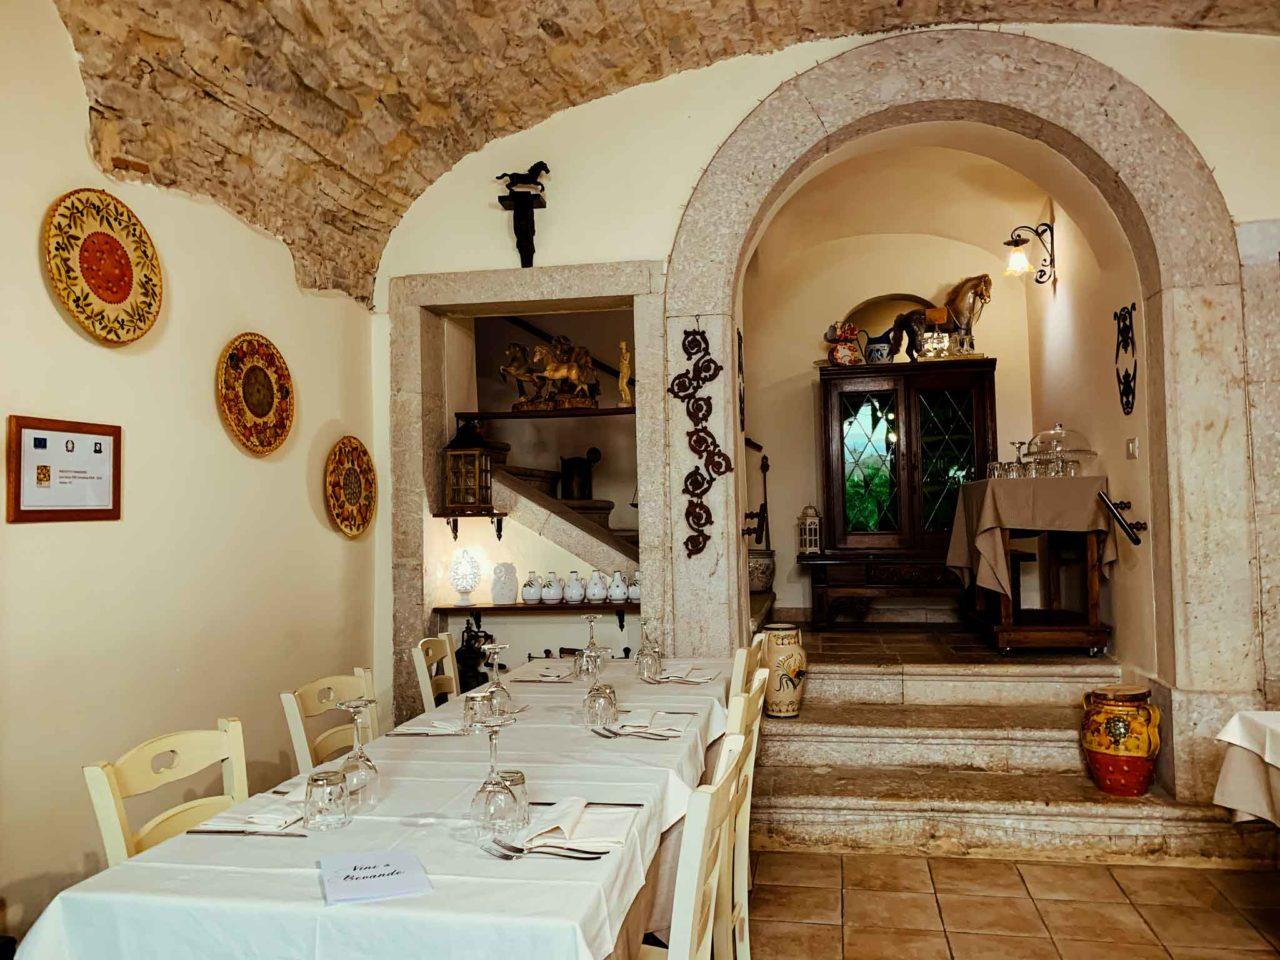 ristorante Nel Portone Apice Benevento ingresso